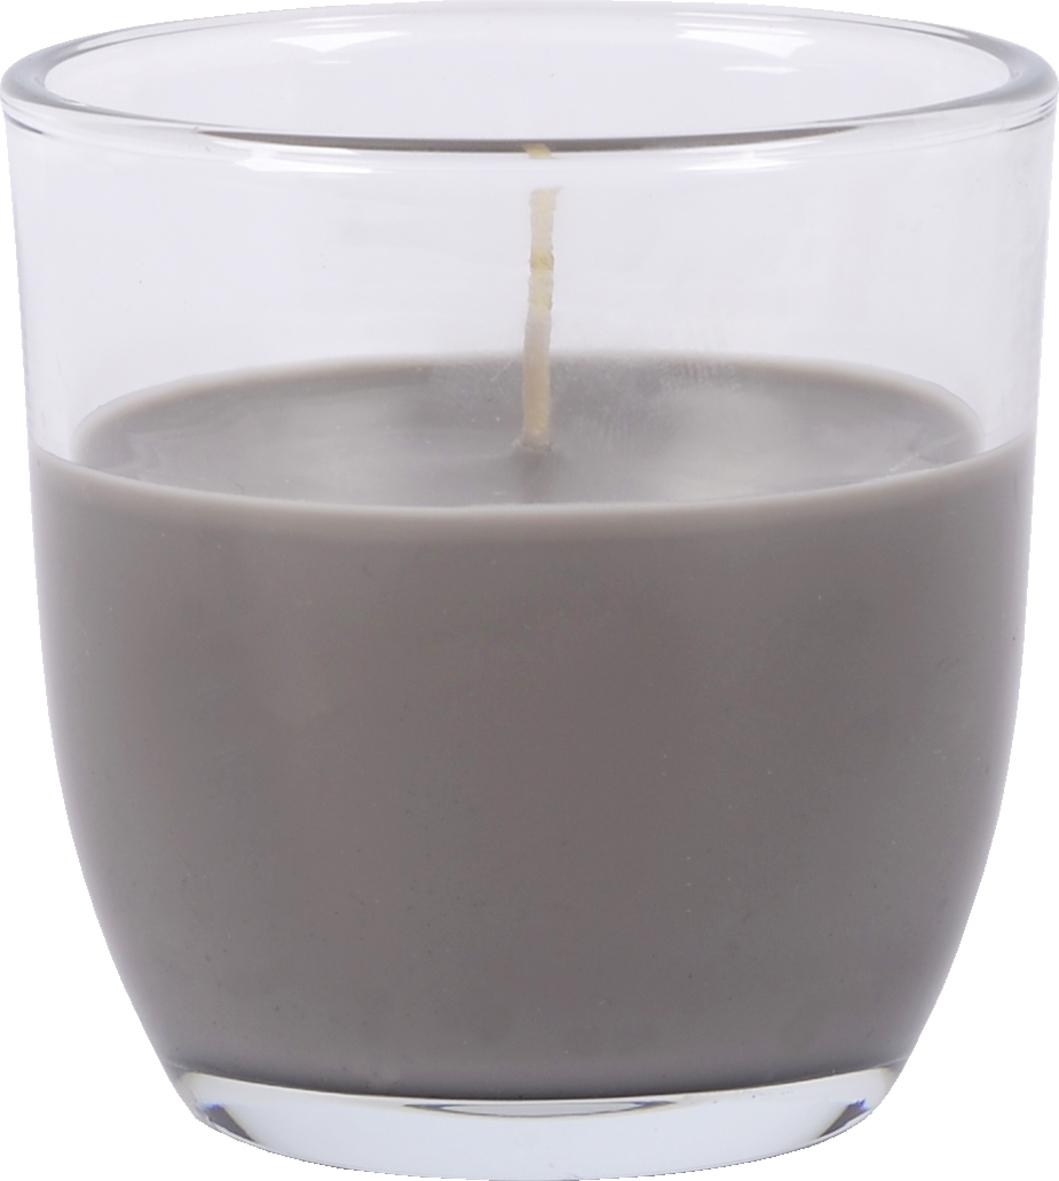 Lumanare parfumata in pahar Migdale Gri, Ø7,5xH7,5 cm poza